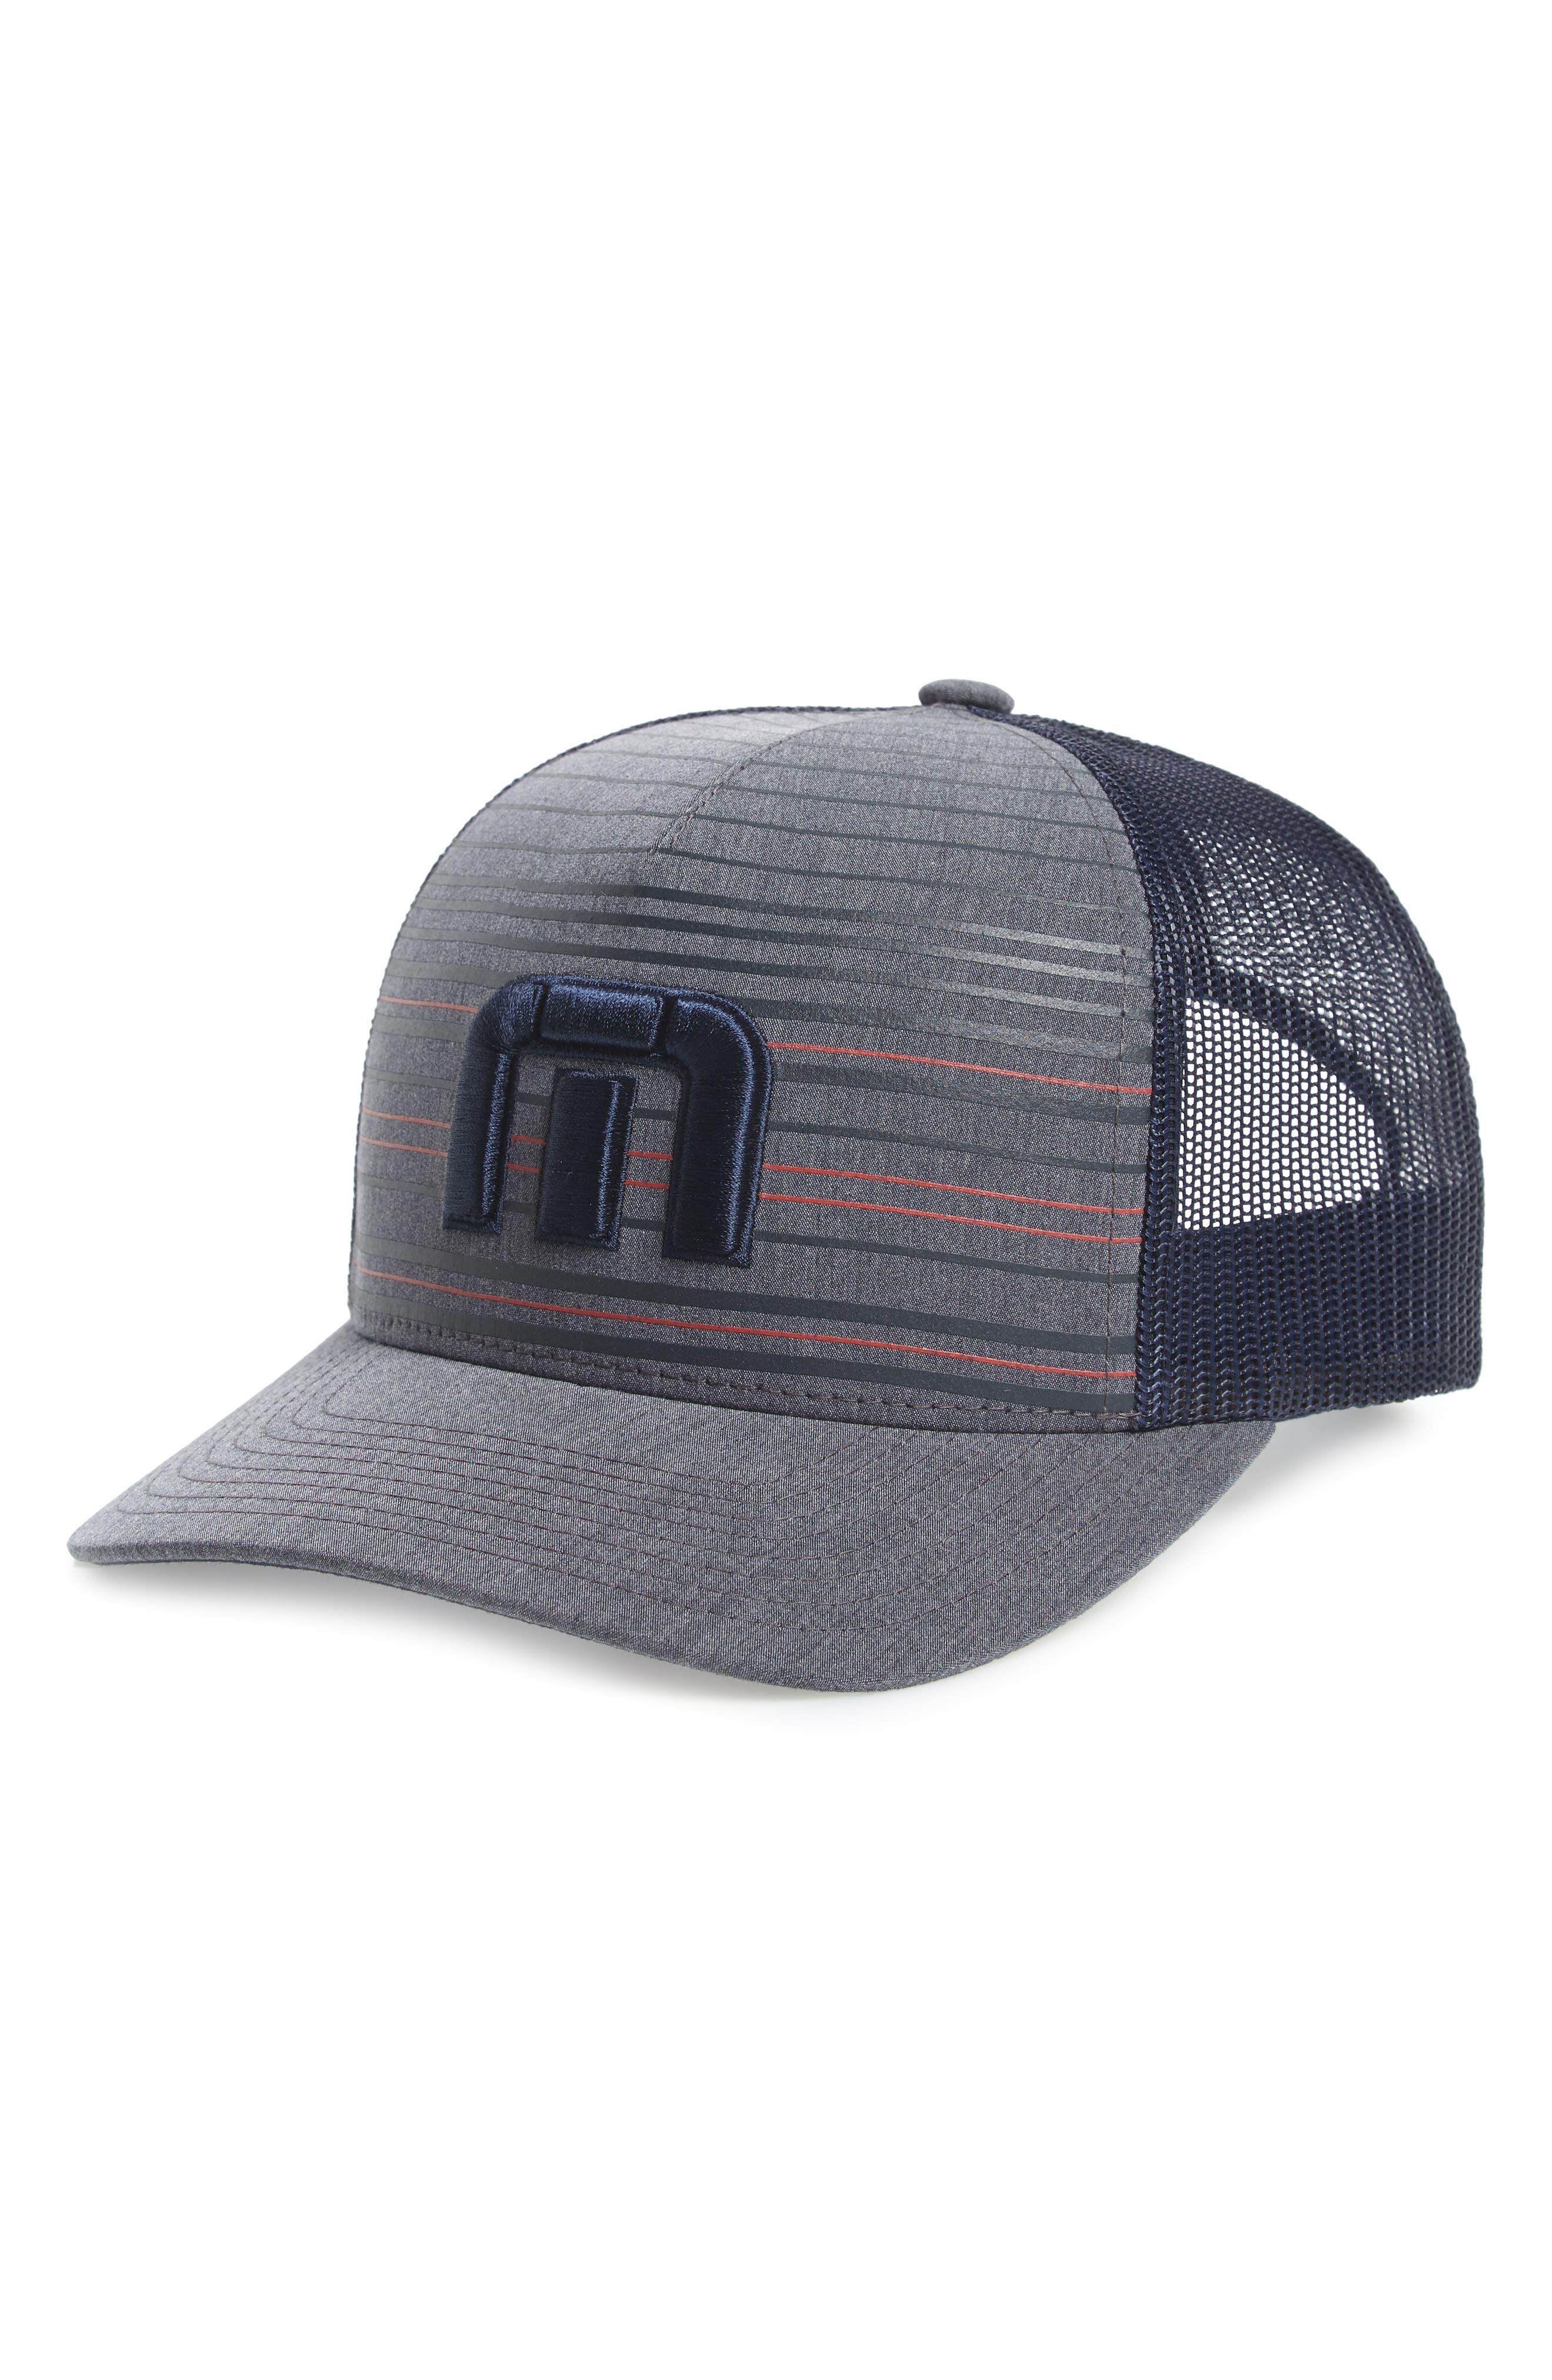 b128f6ab9 Men s Travismathew Hats